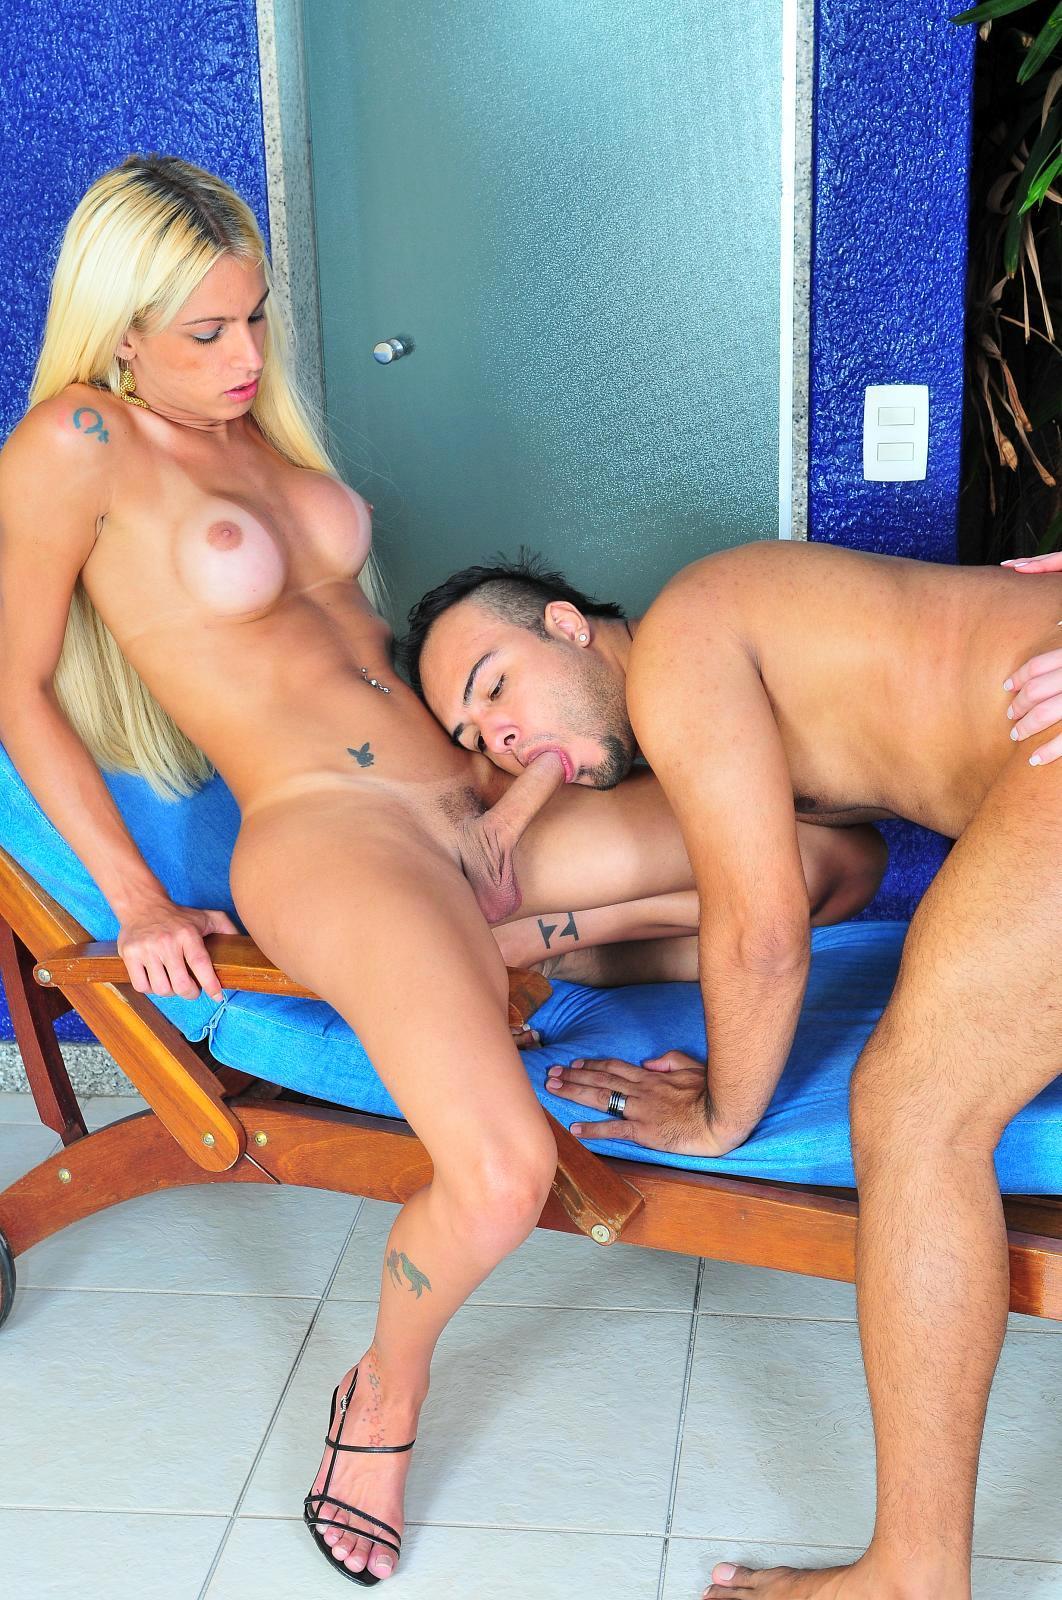 Spicy Ladyboy Ana Paula And Dany De Castro Double Team Dude By